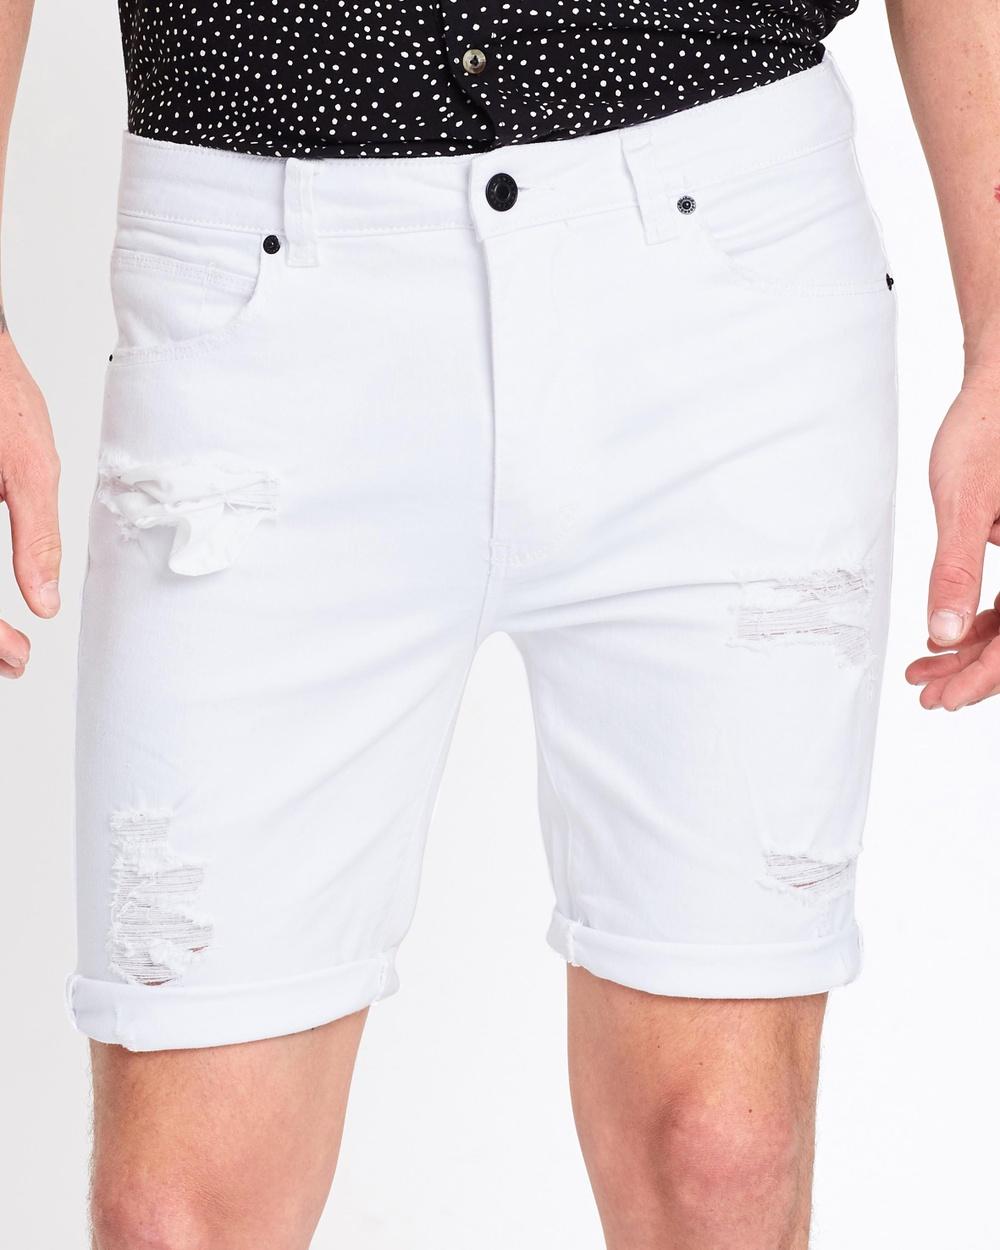 Abrand A Dropped Skinny Shorts Denim Rogue White